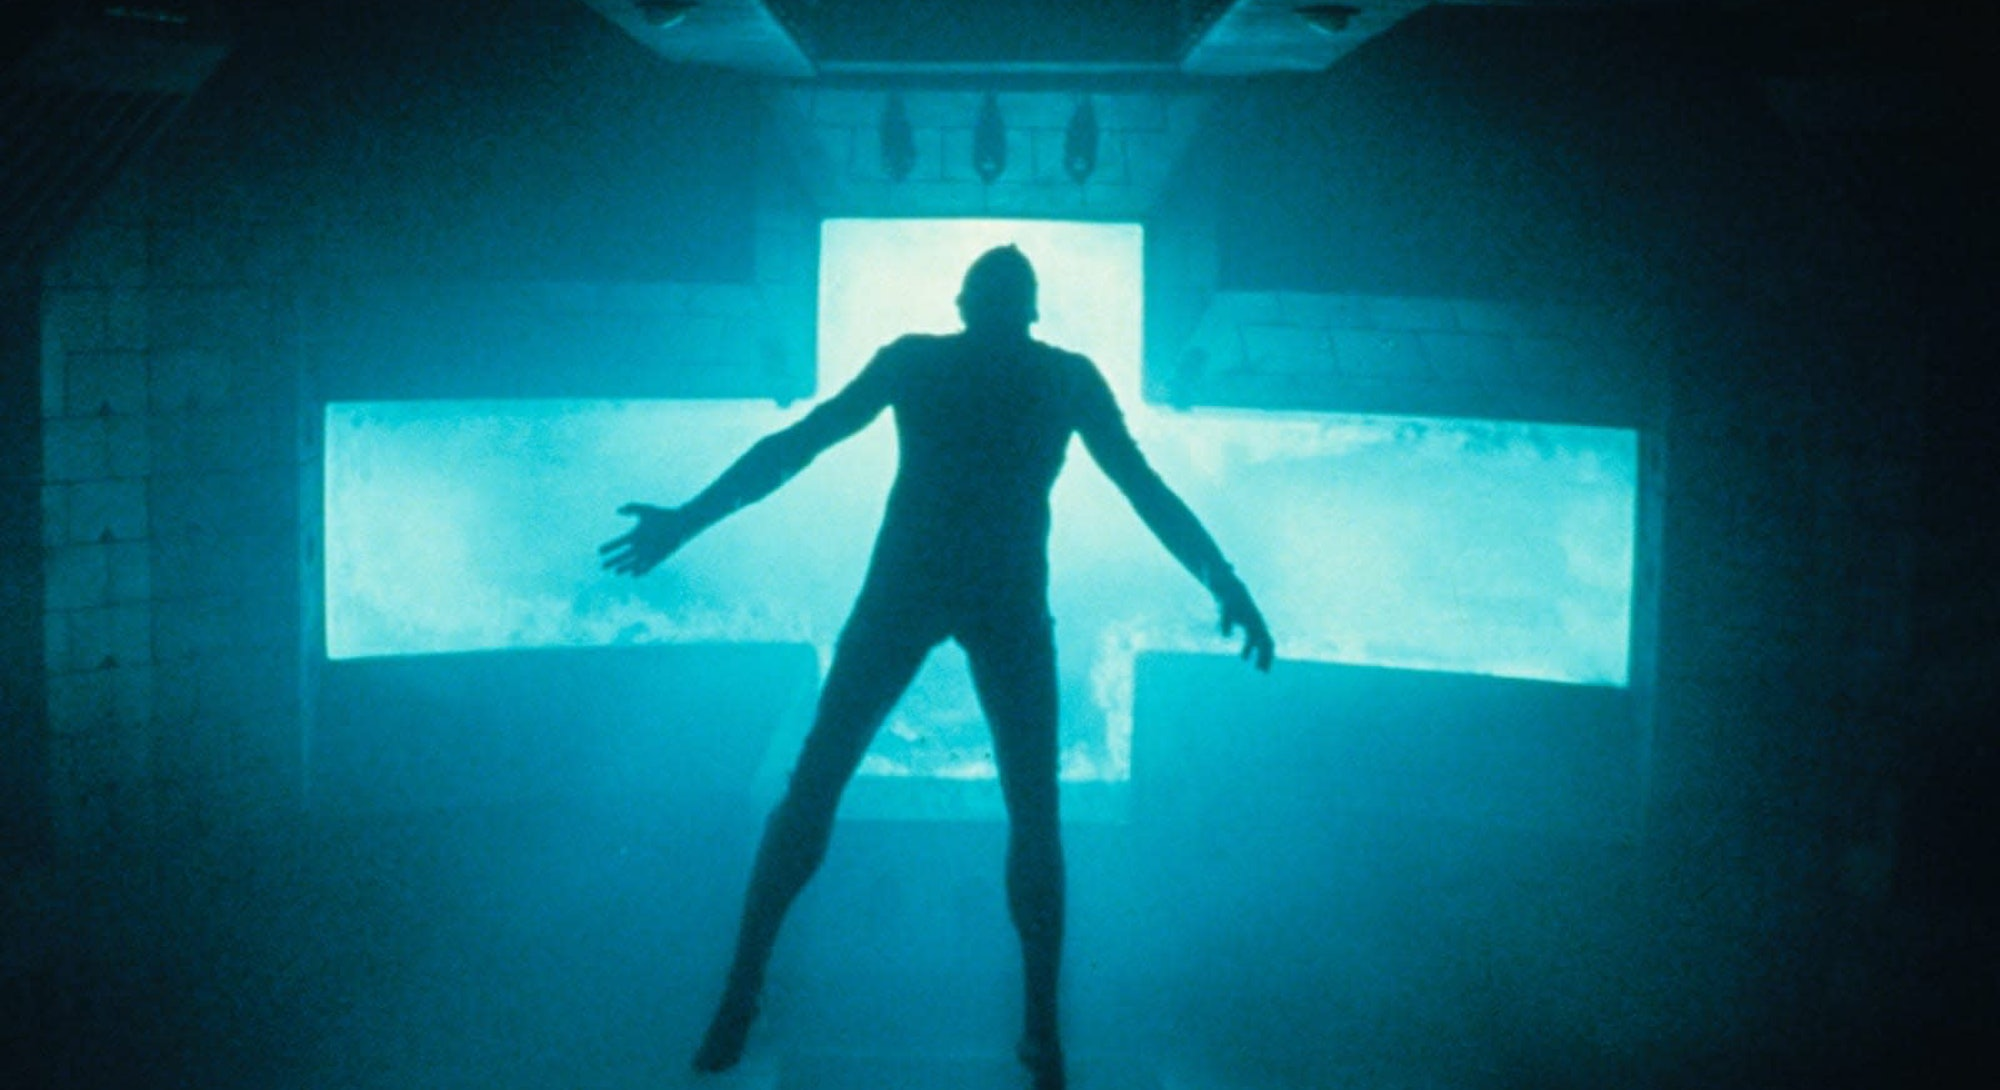 still image from Event Horizon movie